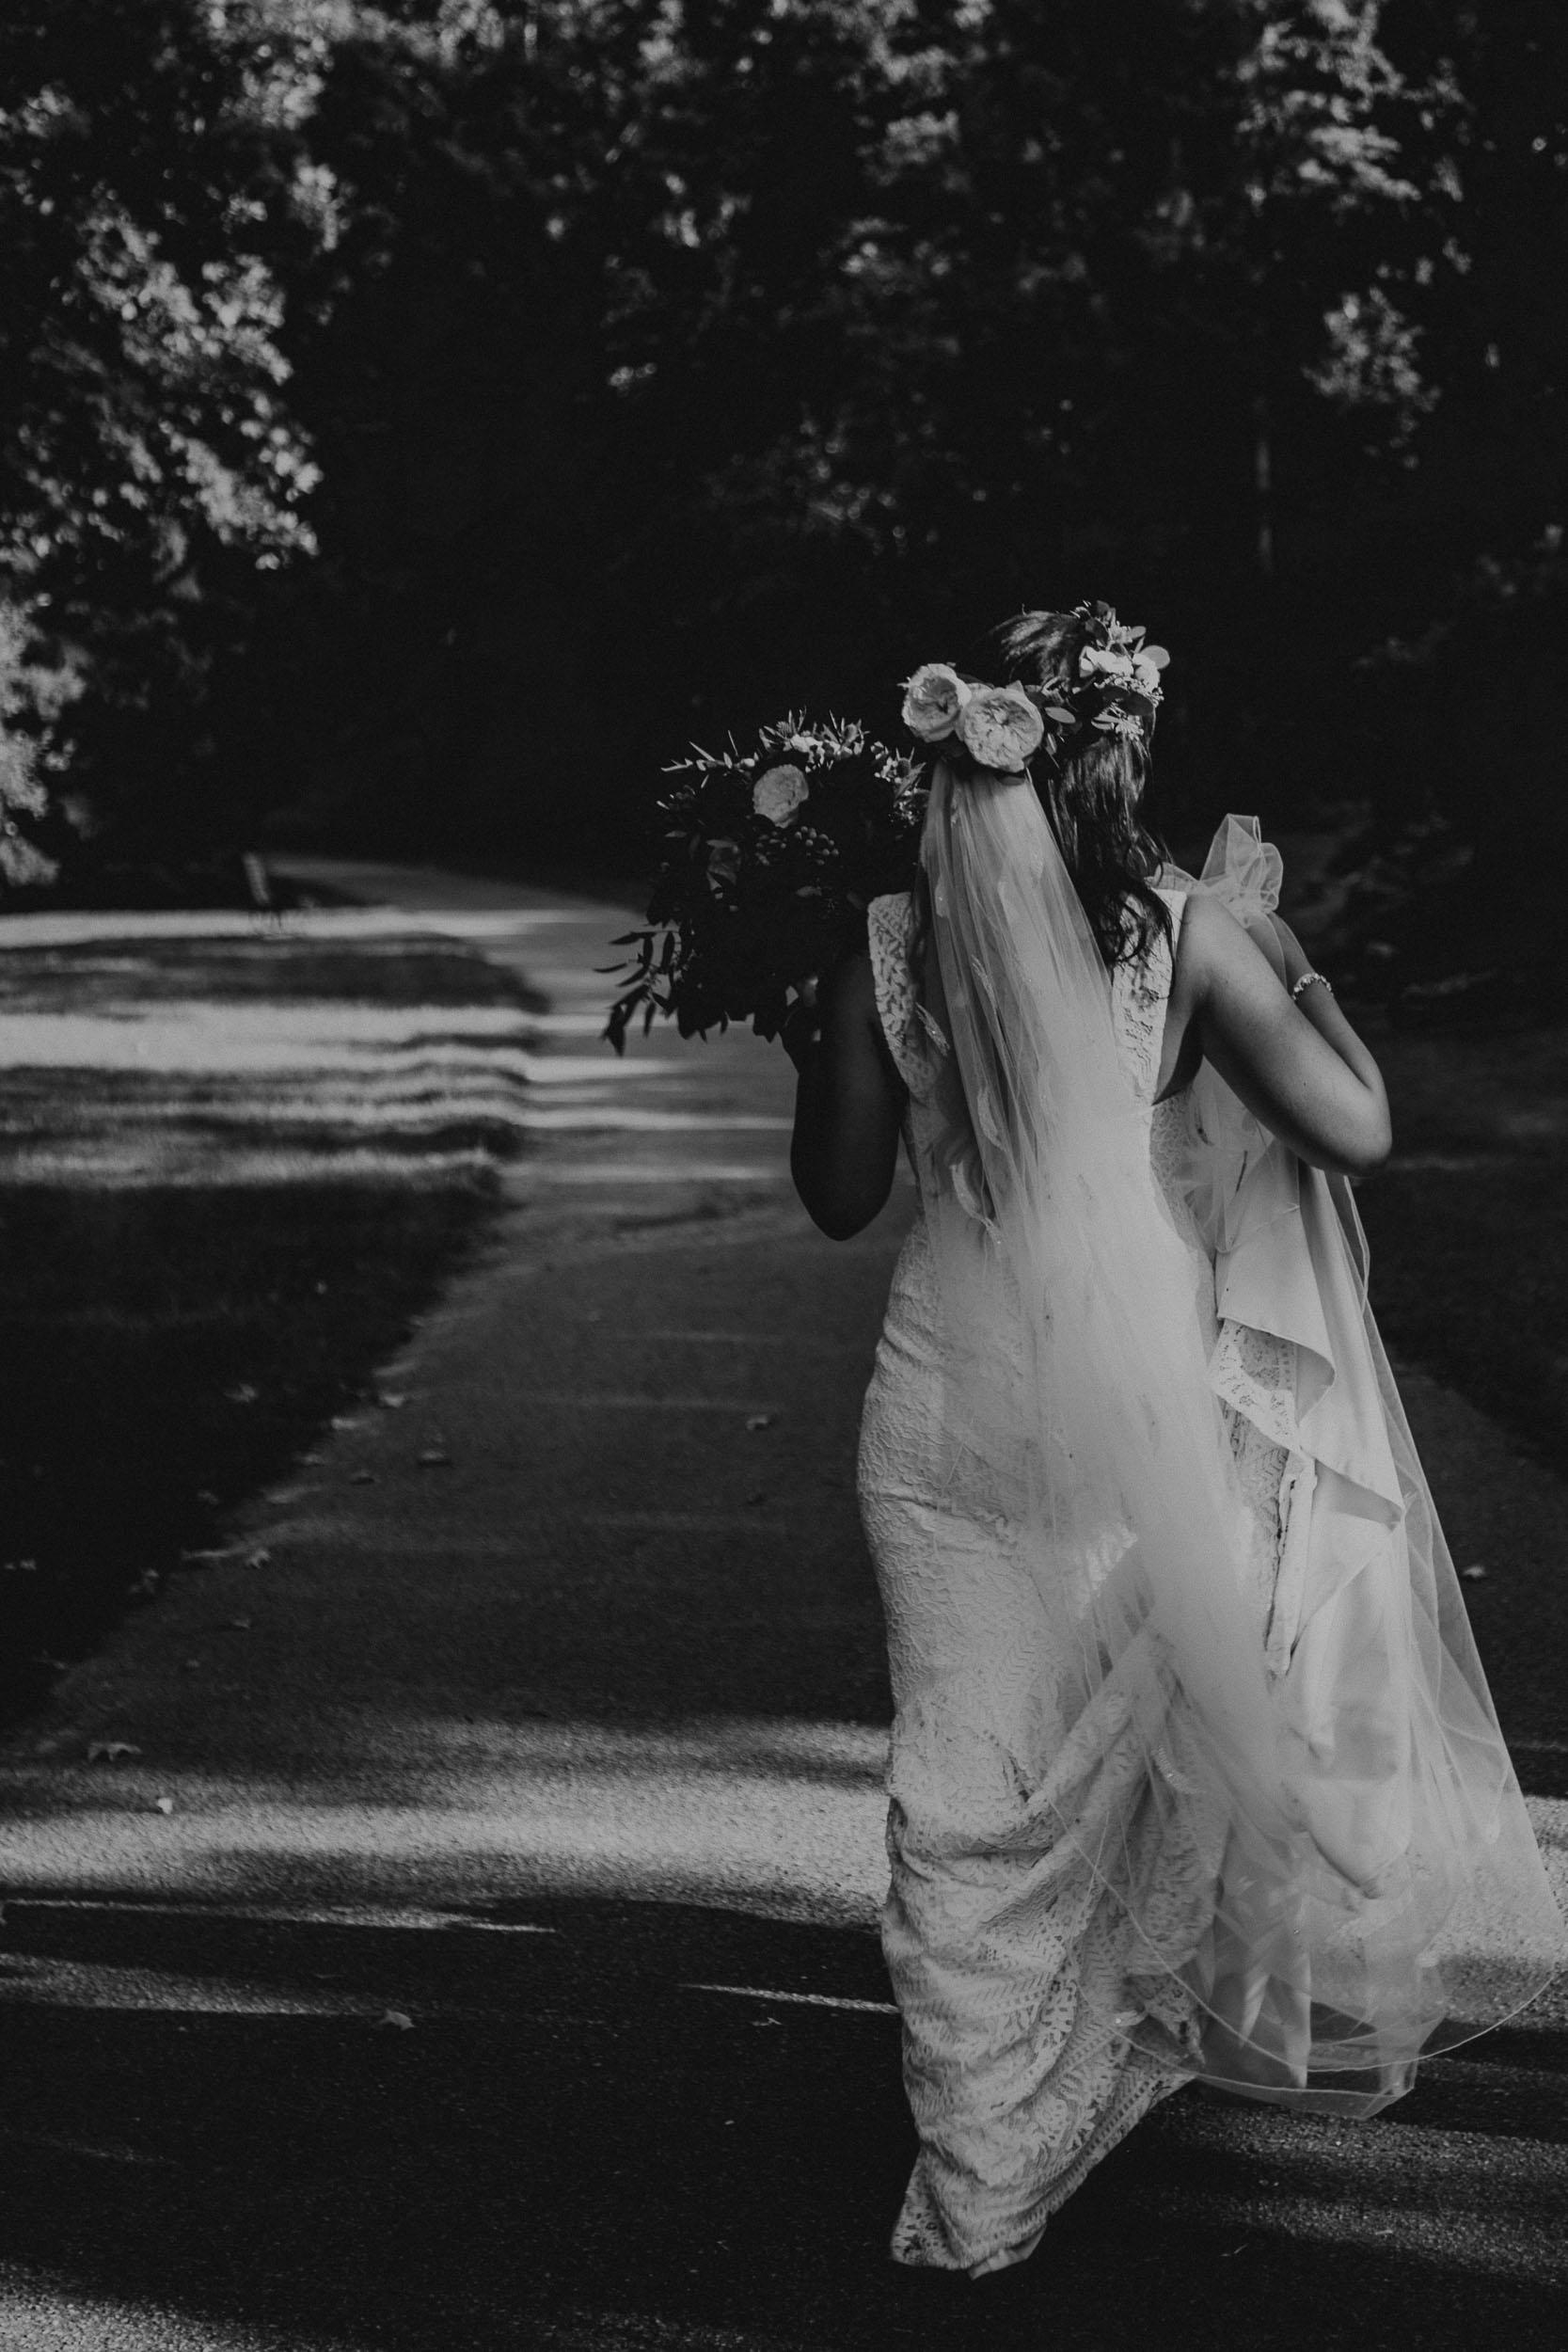 intimate-wedding-elopement-photographer-ottawa-toronto-7437.jpg